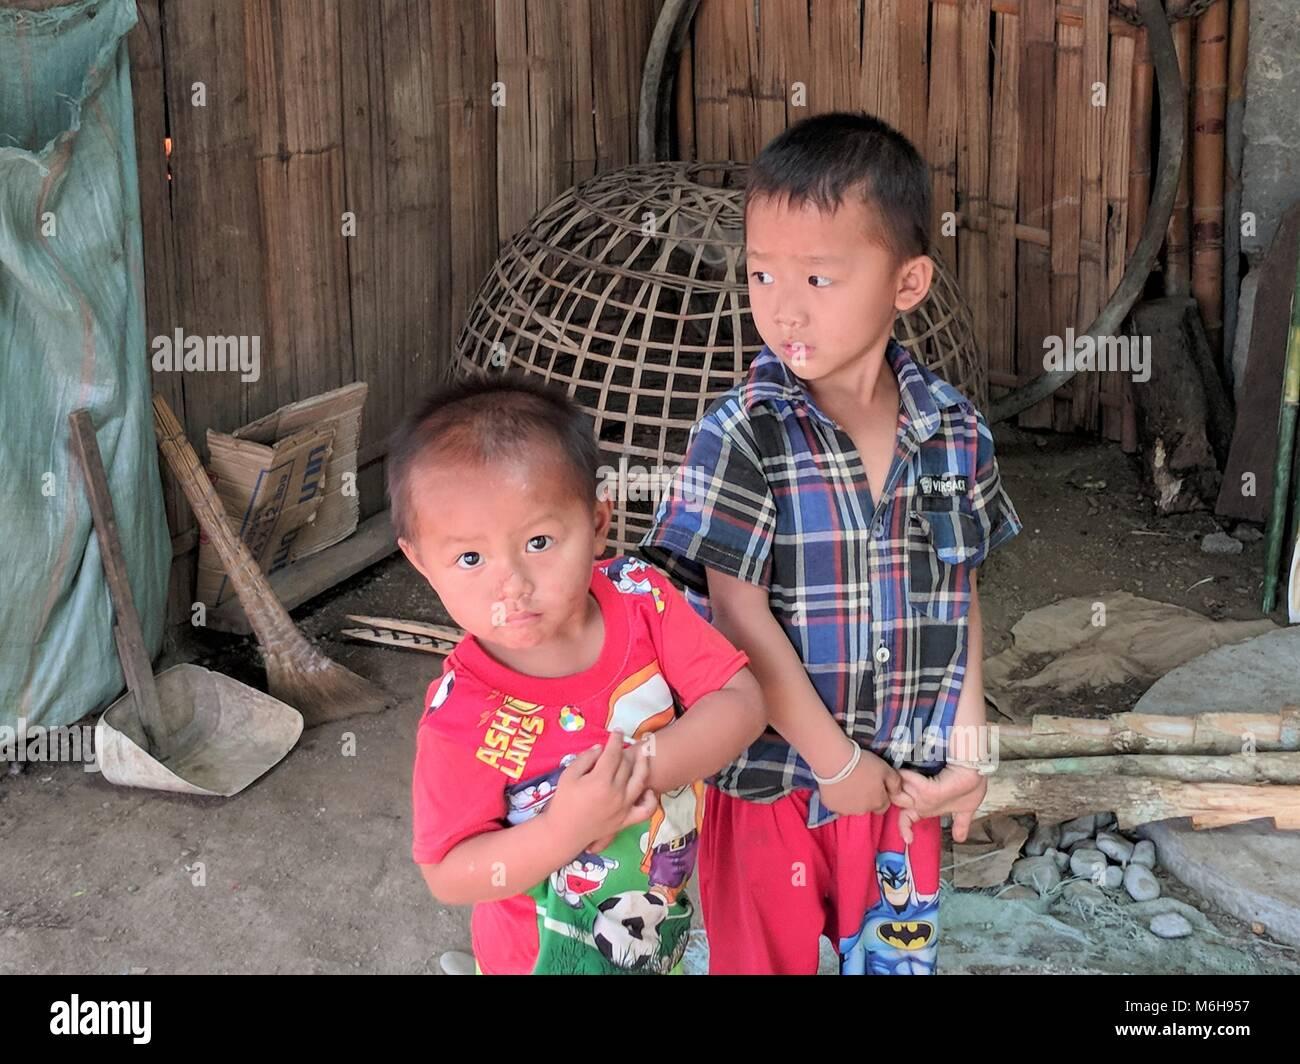 Everyday life scenes in Laos - Stock Image